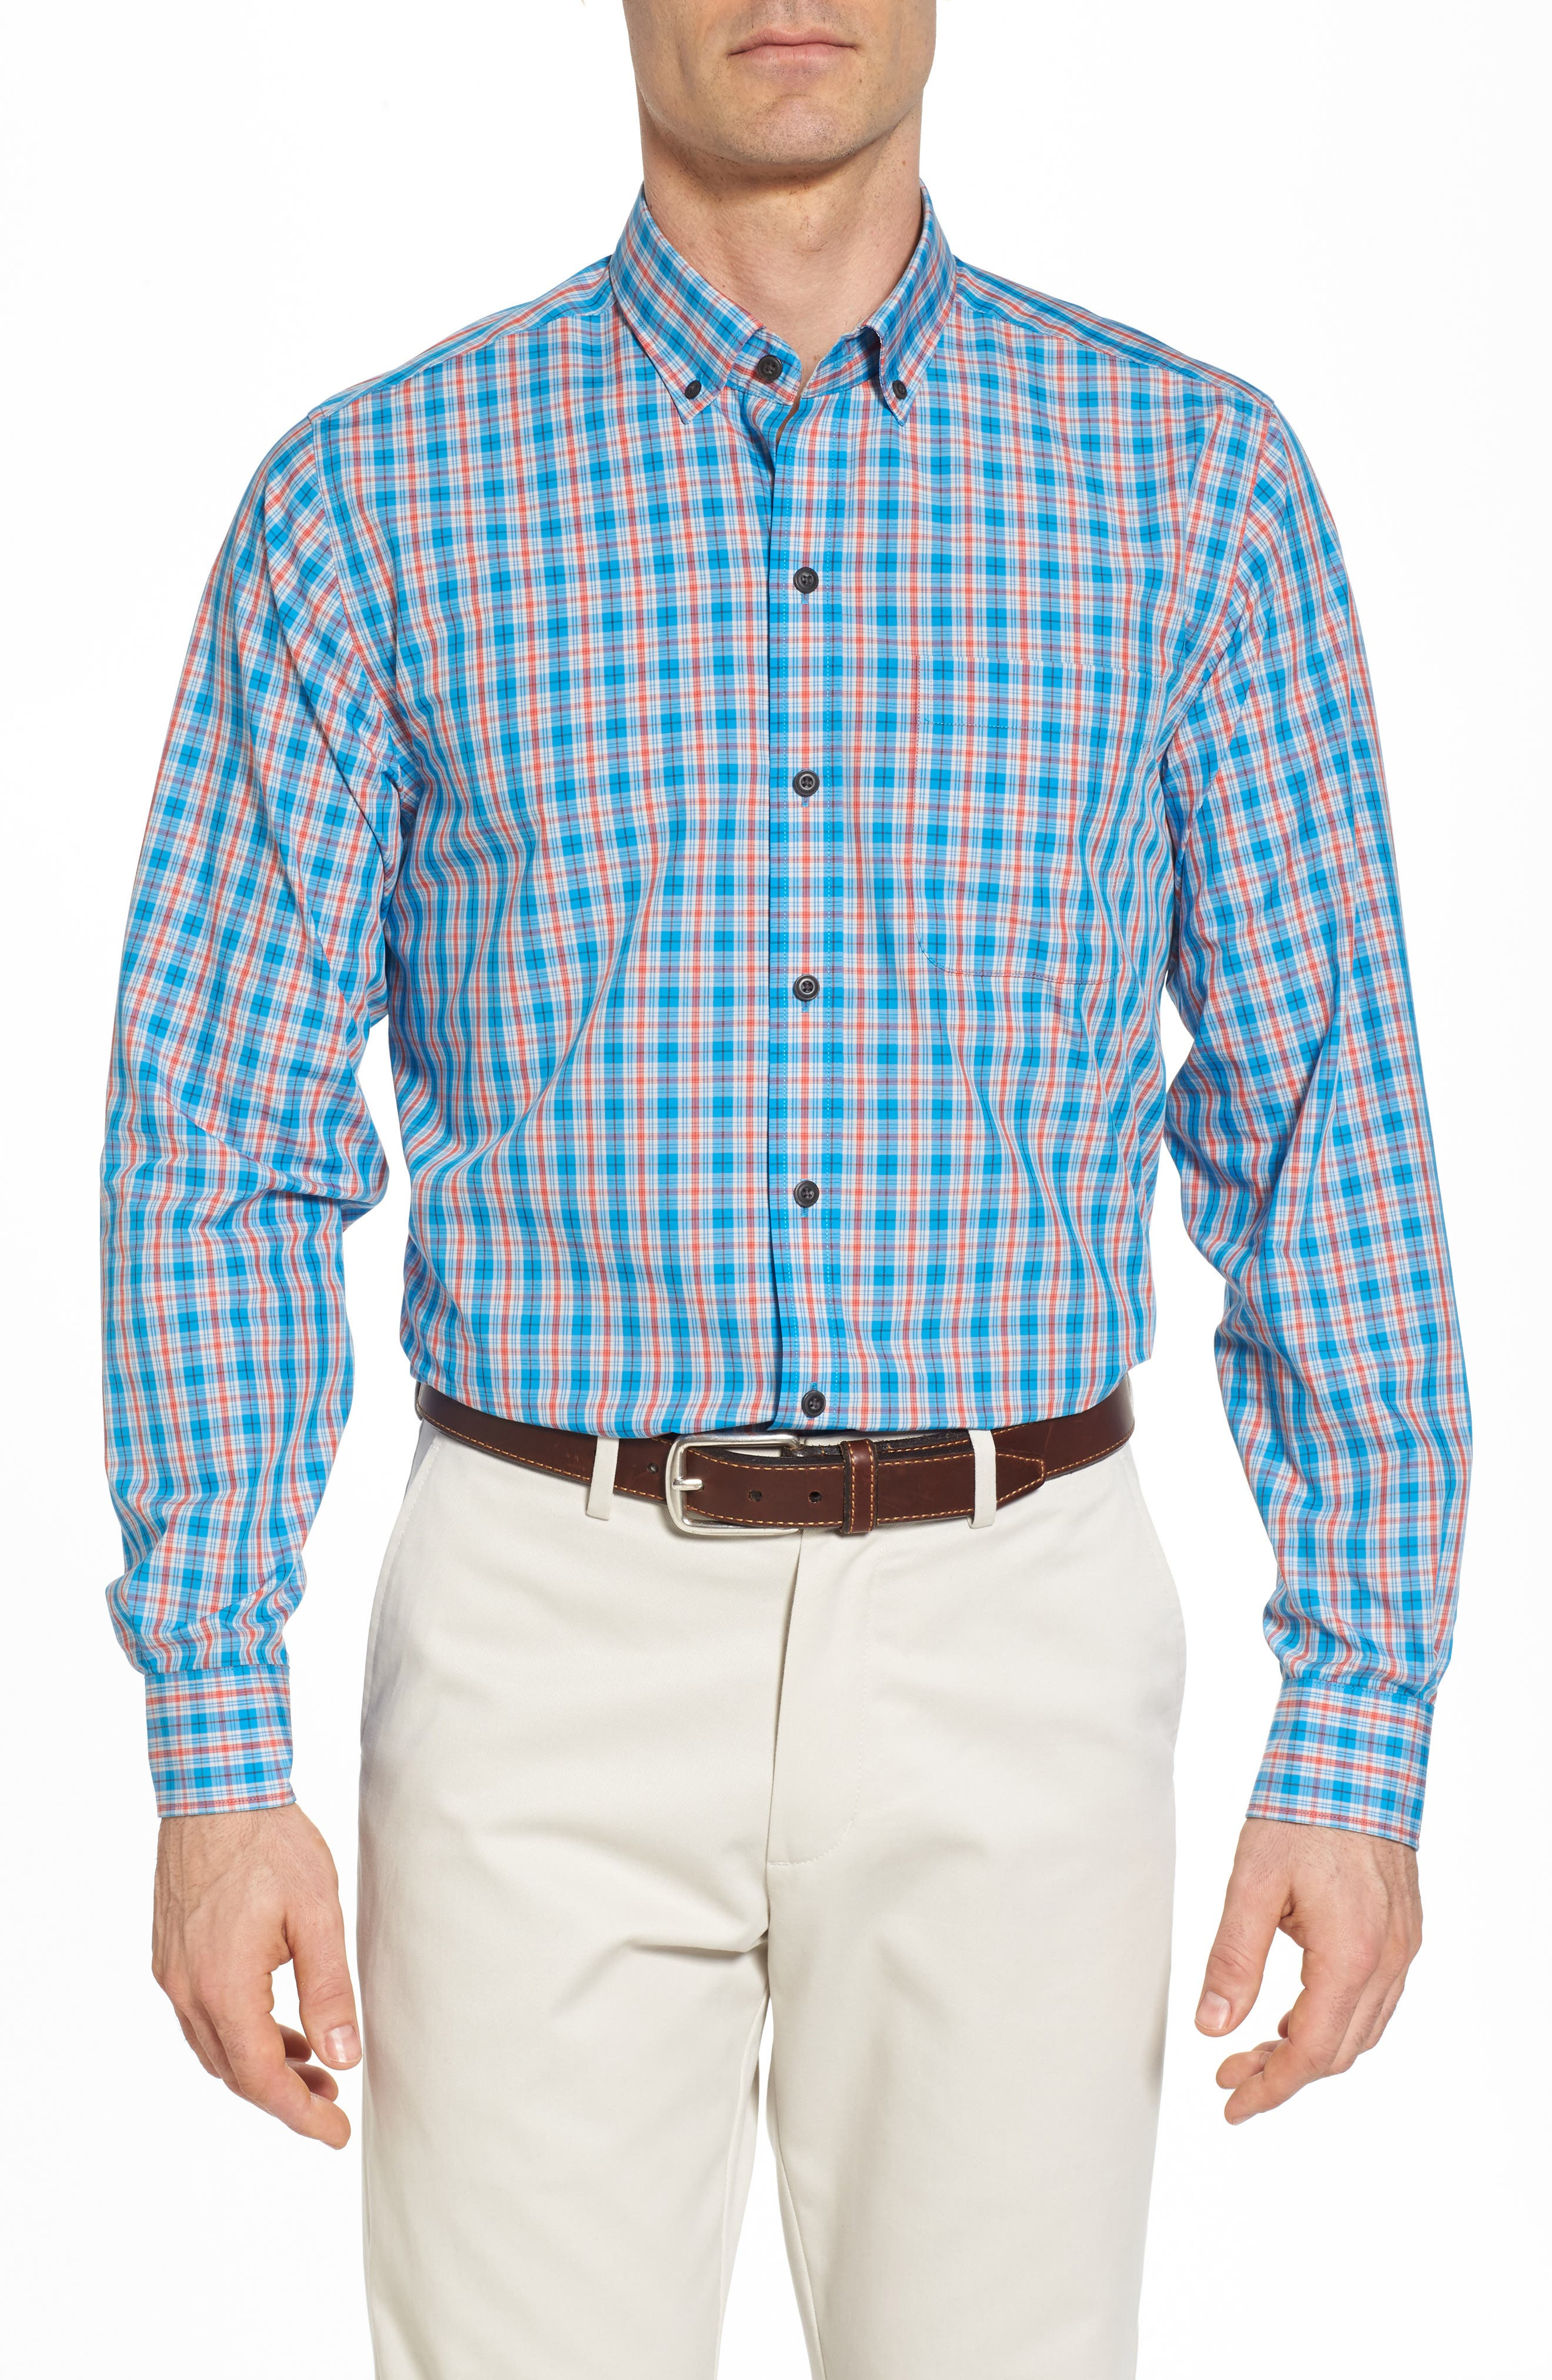 Landon Classic Fit Non-Iron Plaid Sport Shirt,                             Main thumbnail 1, color,                             Poolside